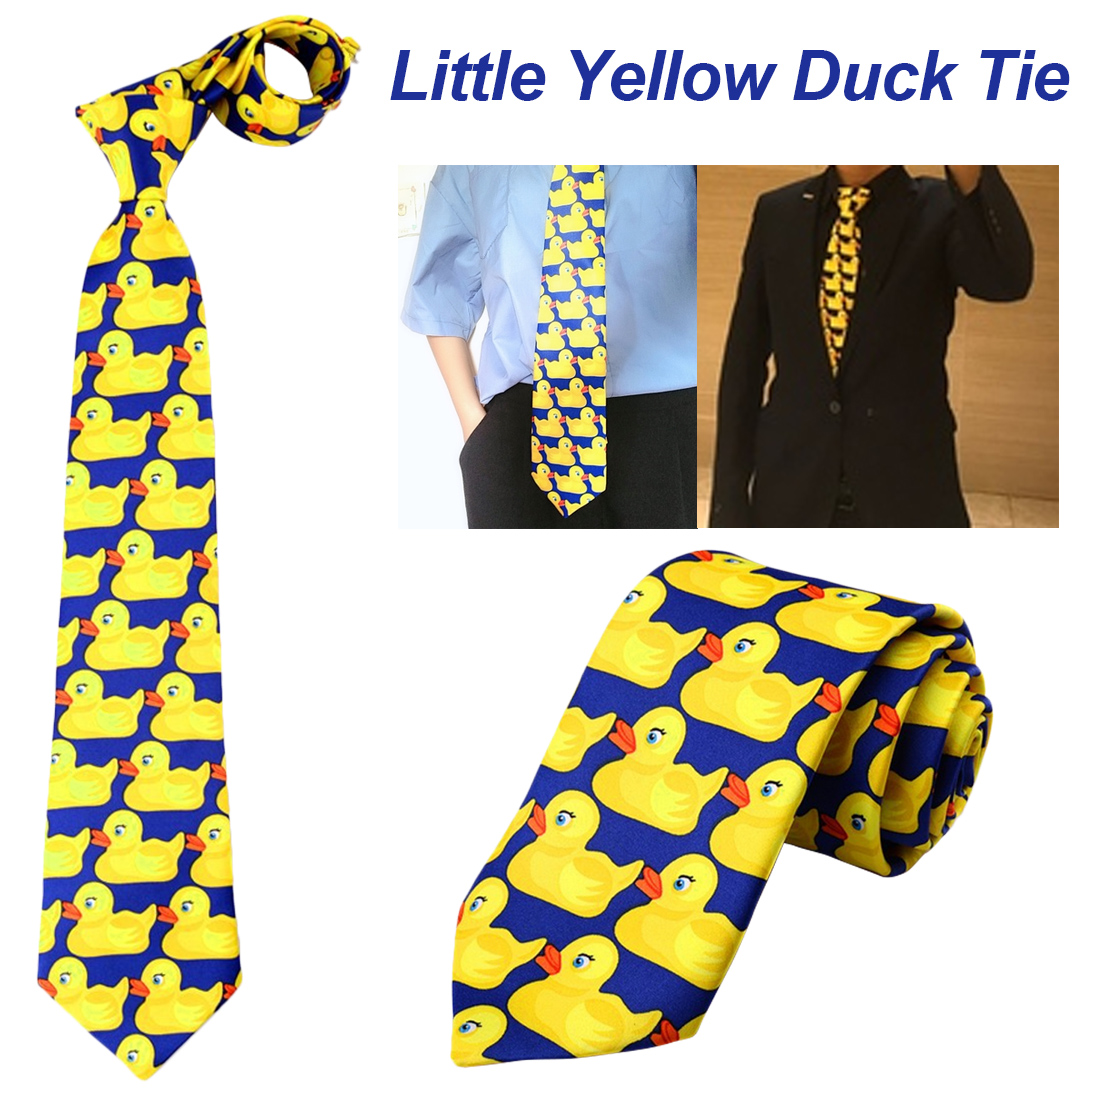 Men Fashion Casual Fancy Ducky Professional Necktie New Cute Ducky Tie Little Yellow Duck Tie 1Pcs Yellow Funny Rubber Duck Tie in Men 39 s Ties amp Handkerchiefs from Apparel Accessories